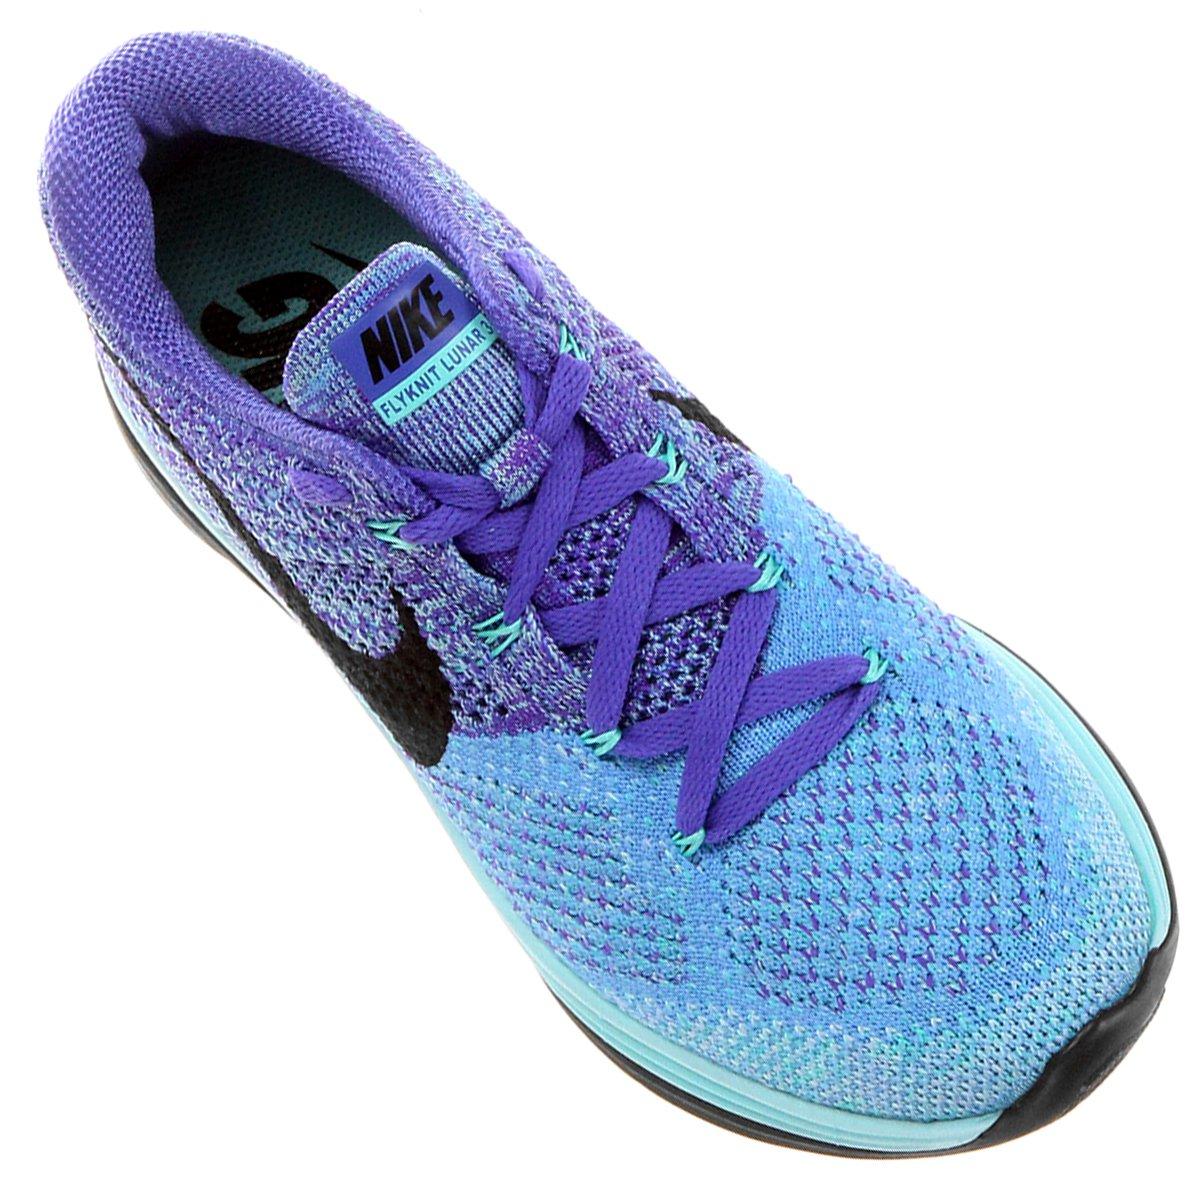 huge selection of 2883e dd0e1 ... netshoes e3ea8 12c0c  shopping tênis nike flyknit lunar 3 azul piscina  ce7f6 bdf72